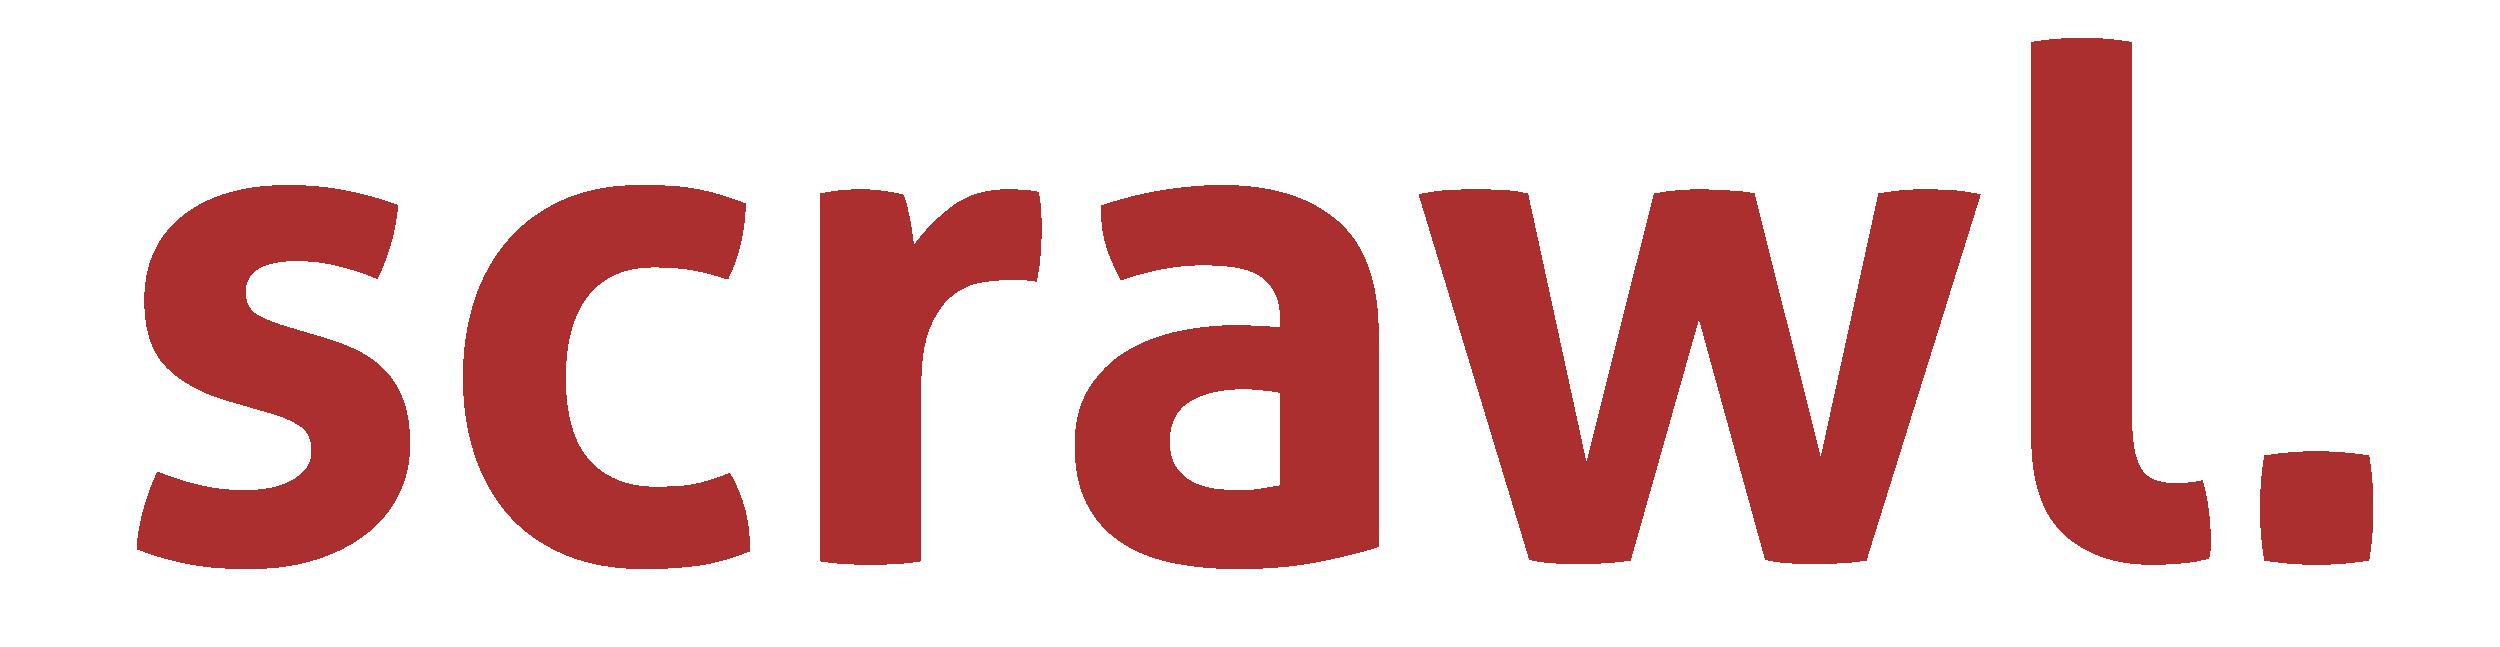 Scrawl Design